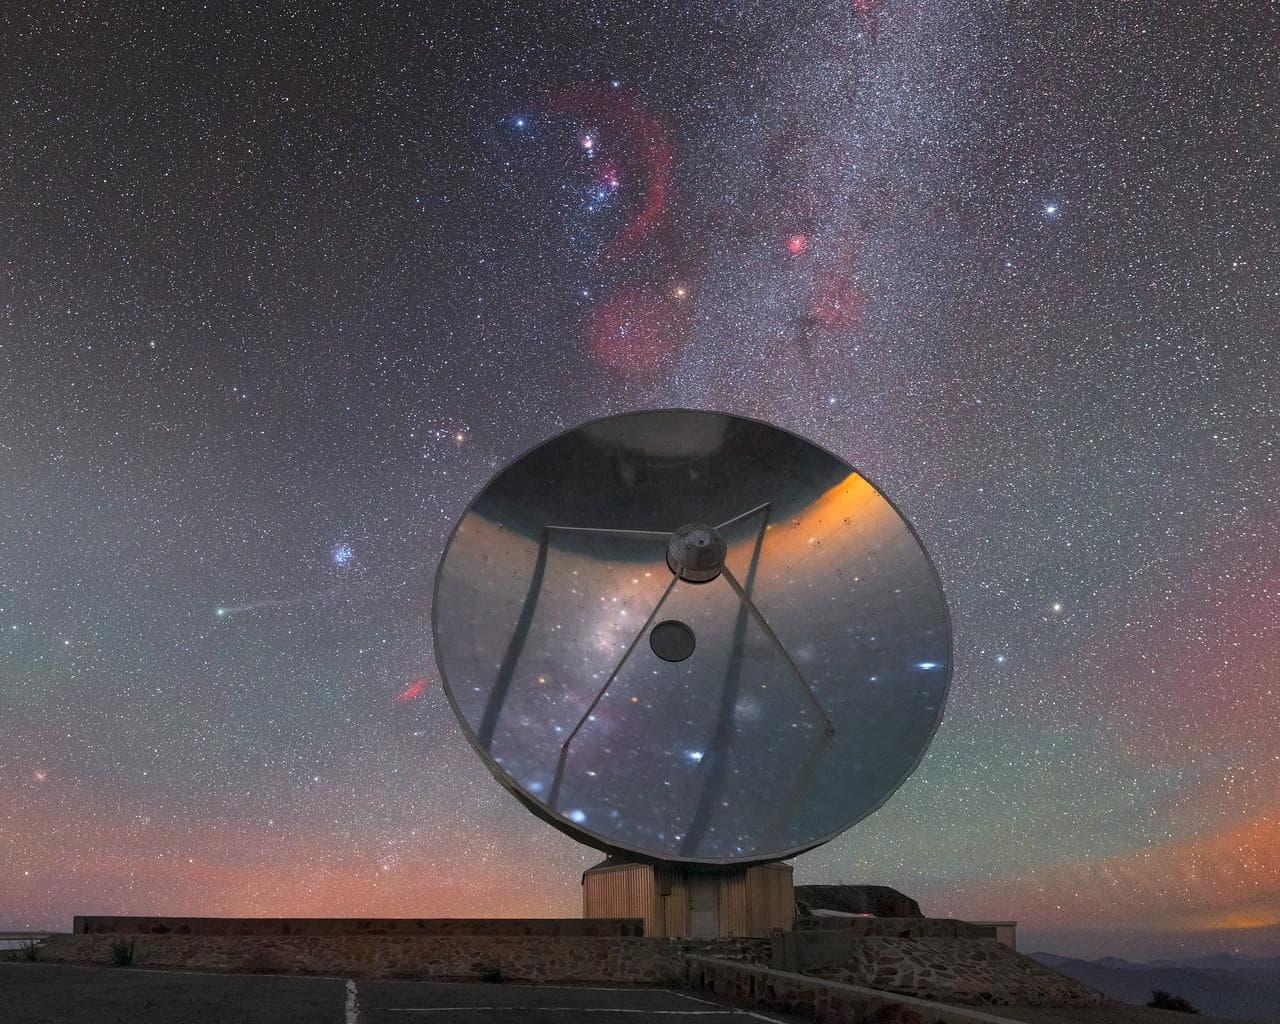 Фото дня: маленький одинокий телескоп